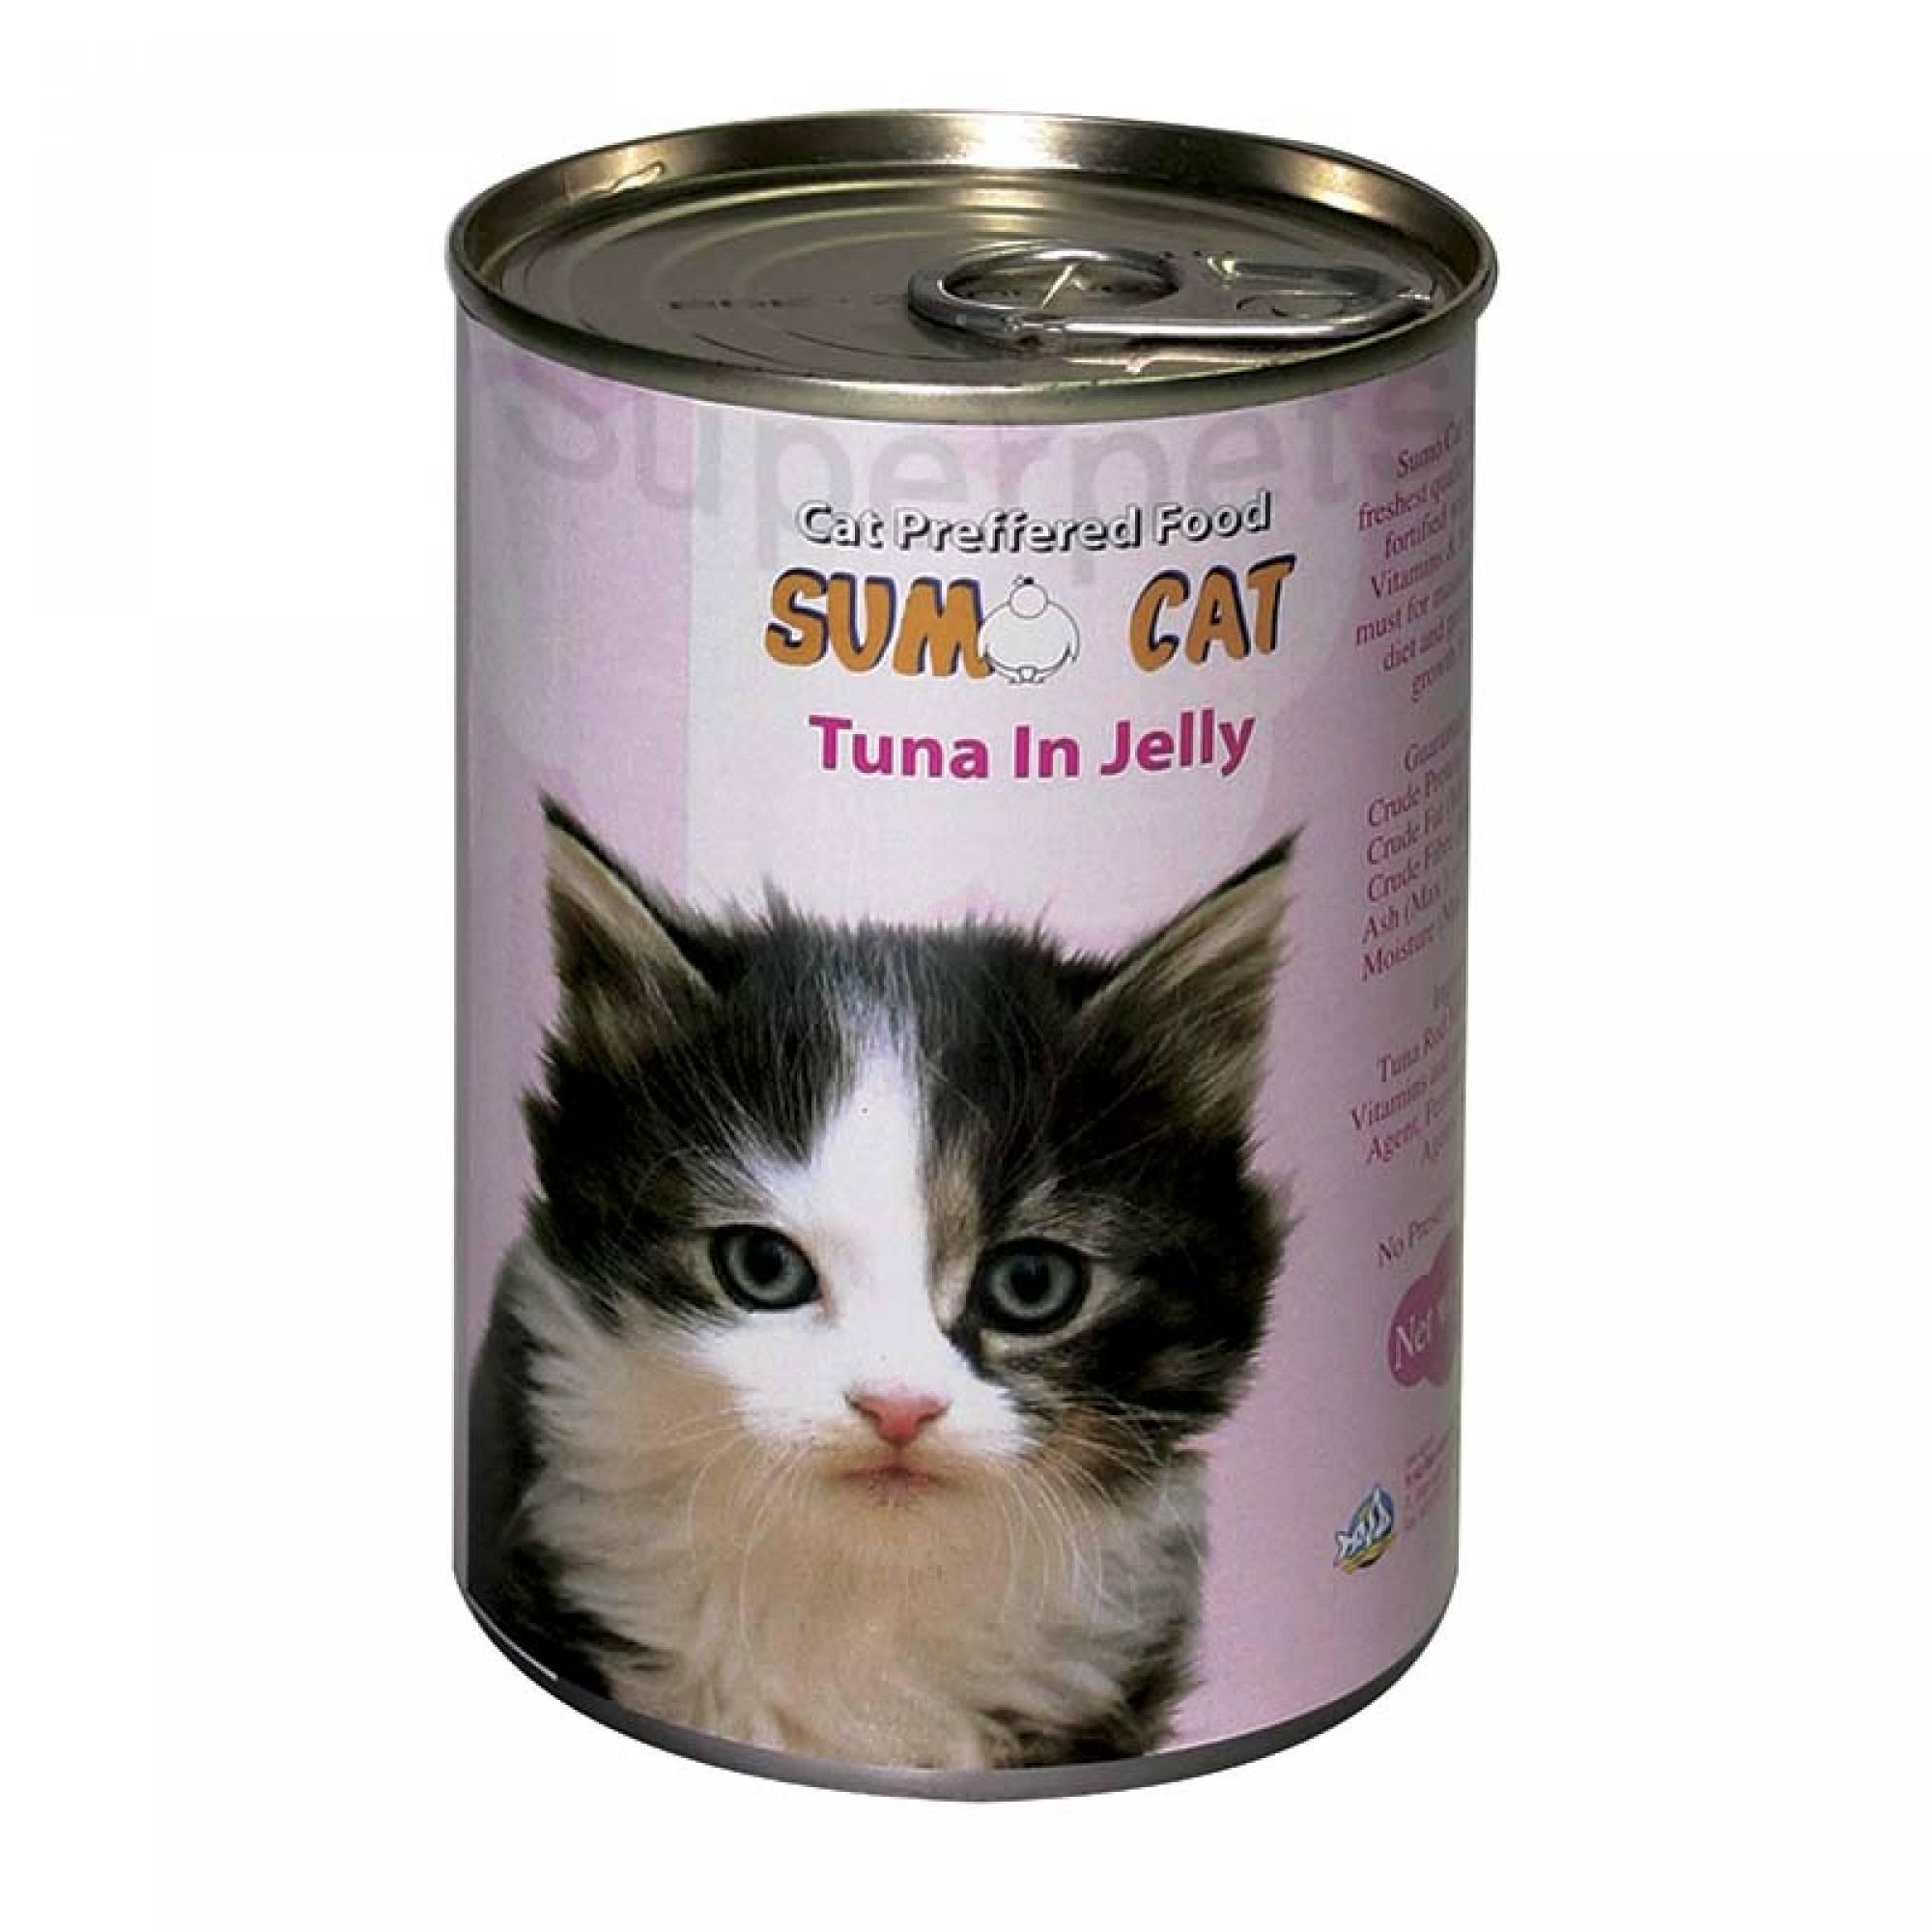 Sumo Cat - Tuna in Jelly 400g x 24pcs (1 carton)